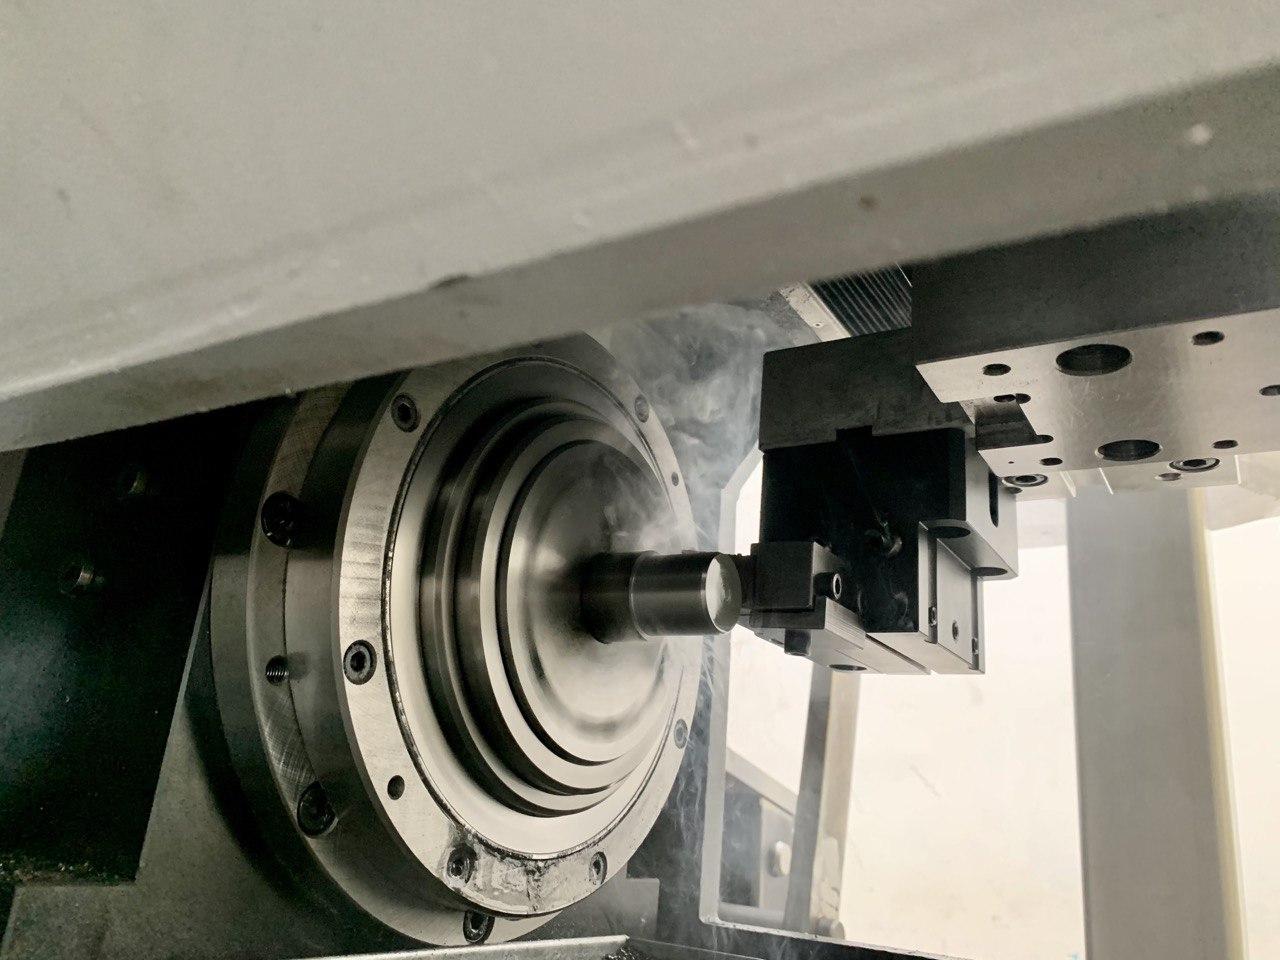 STANGOMAT   Innovative Stangenendenbearbeitungsmaschine vorgestellt